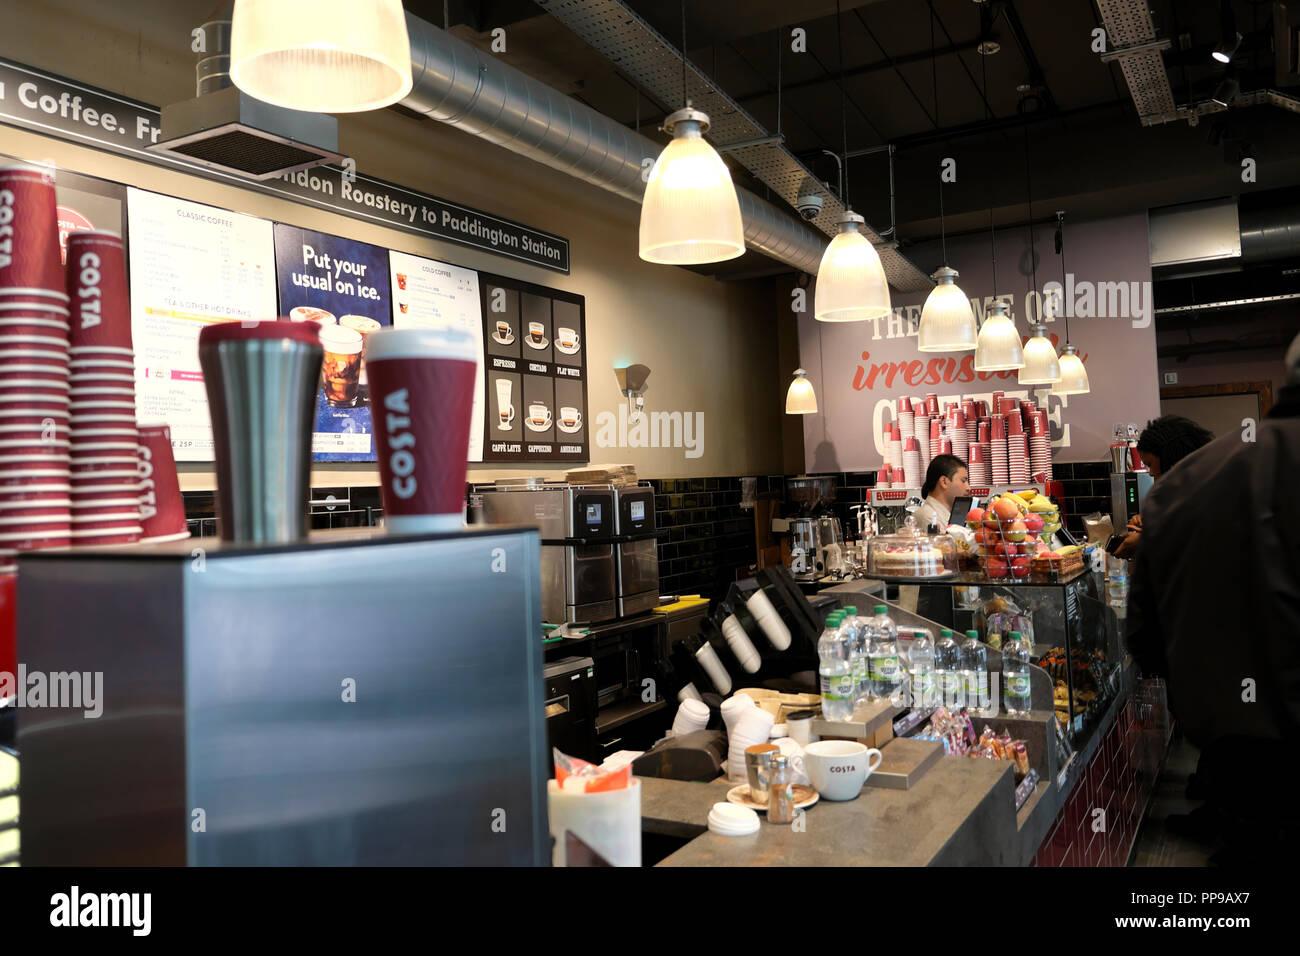 Costa Coffee Interior Stock Photos Costa Coffee Interior